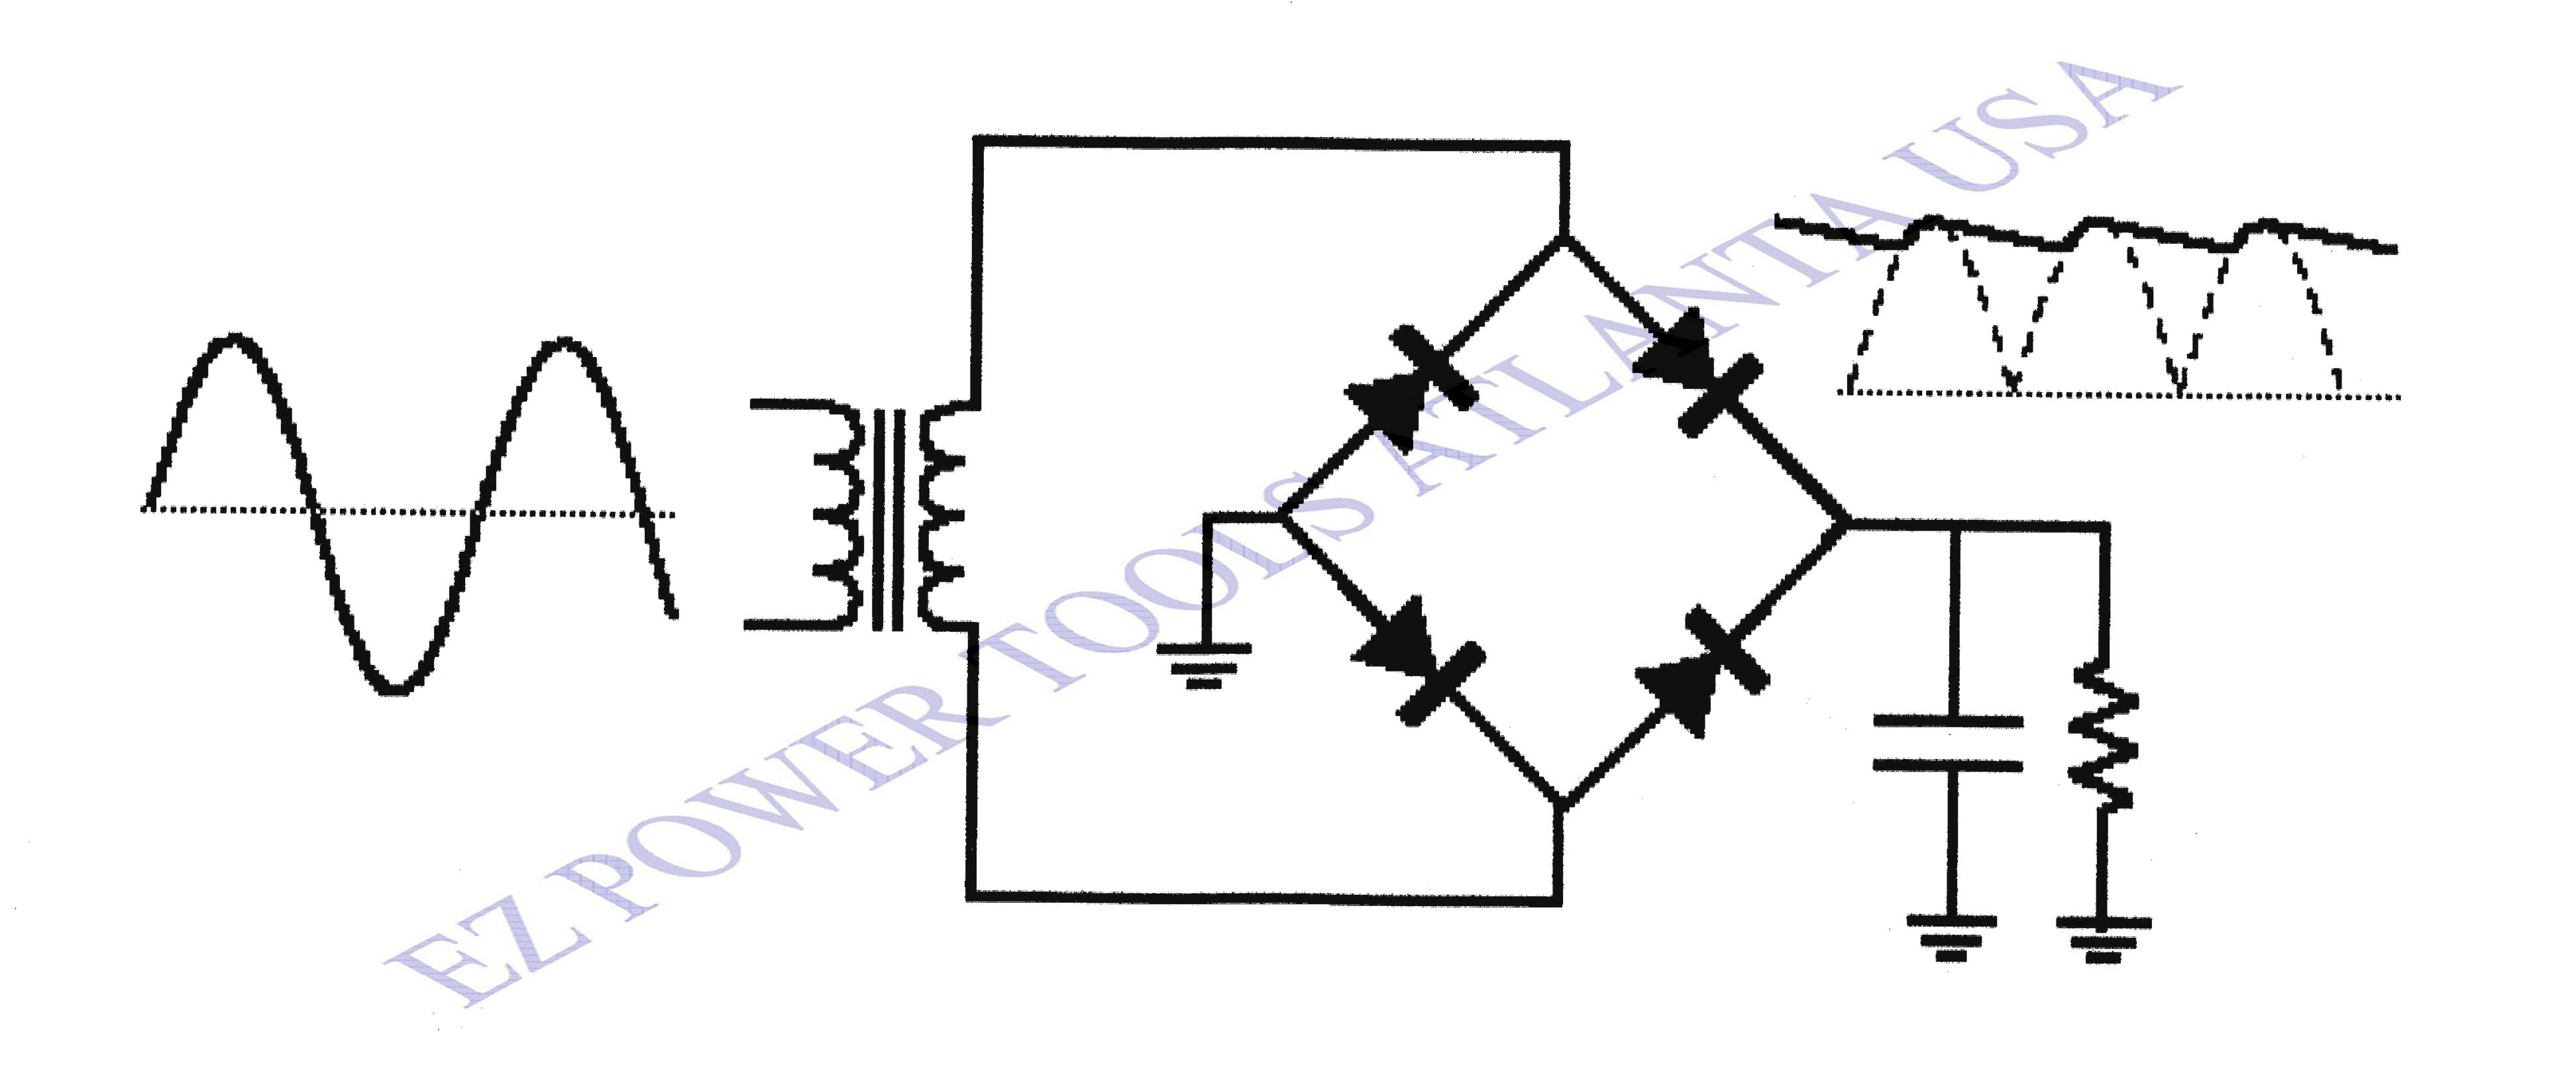 12 Volt Dc Voltage Regulator